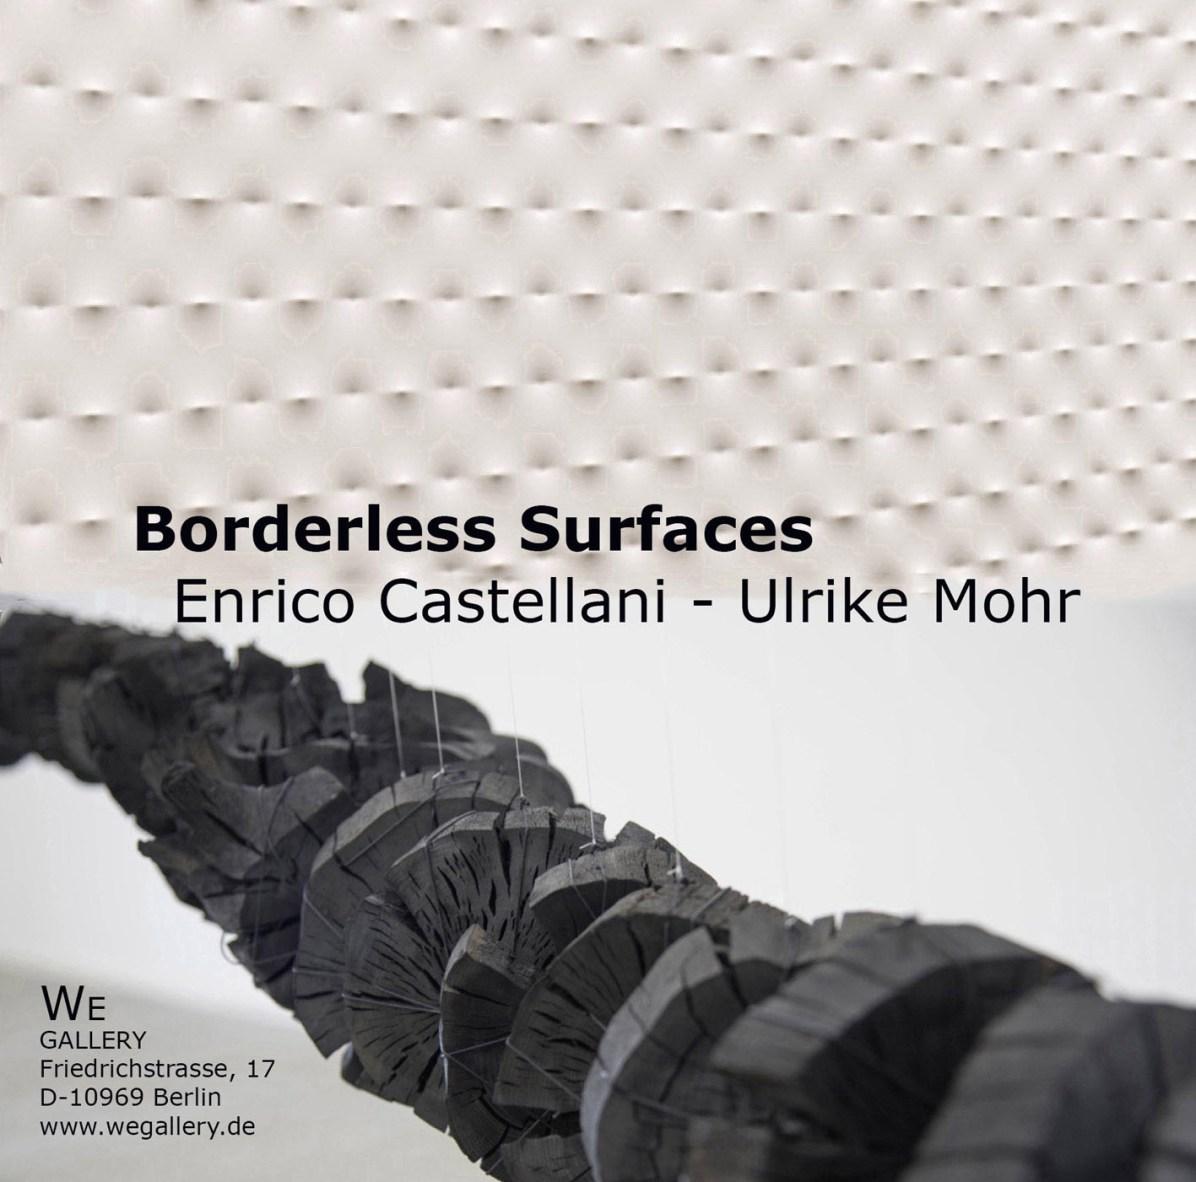 Enrico Castellani - Ulrike Mohr / Borderless Surfaces